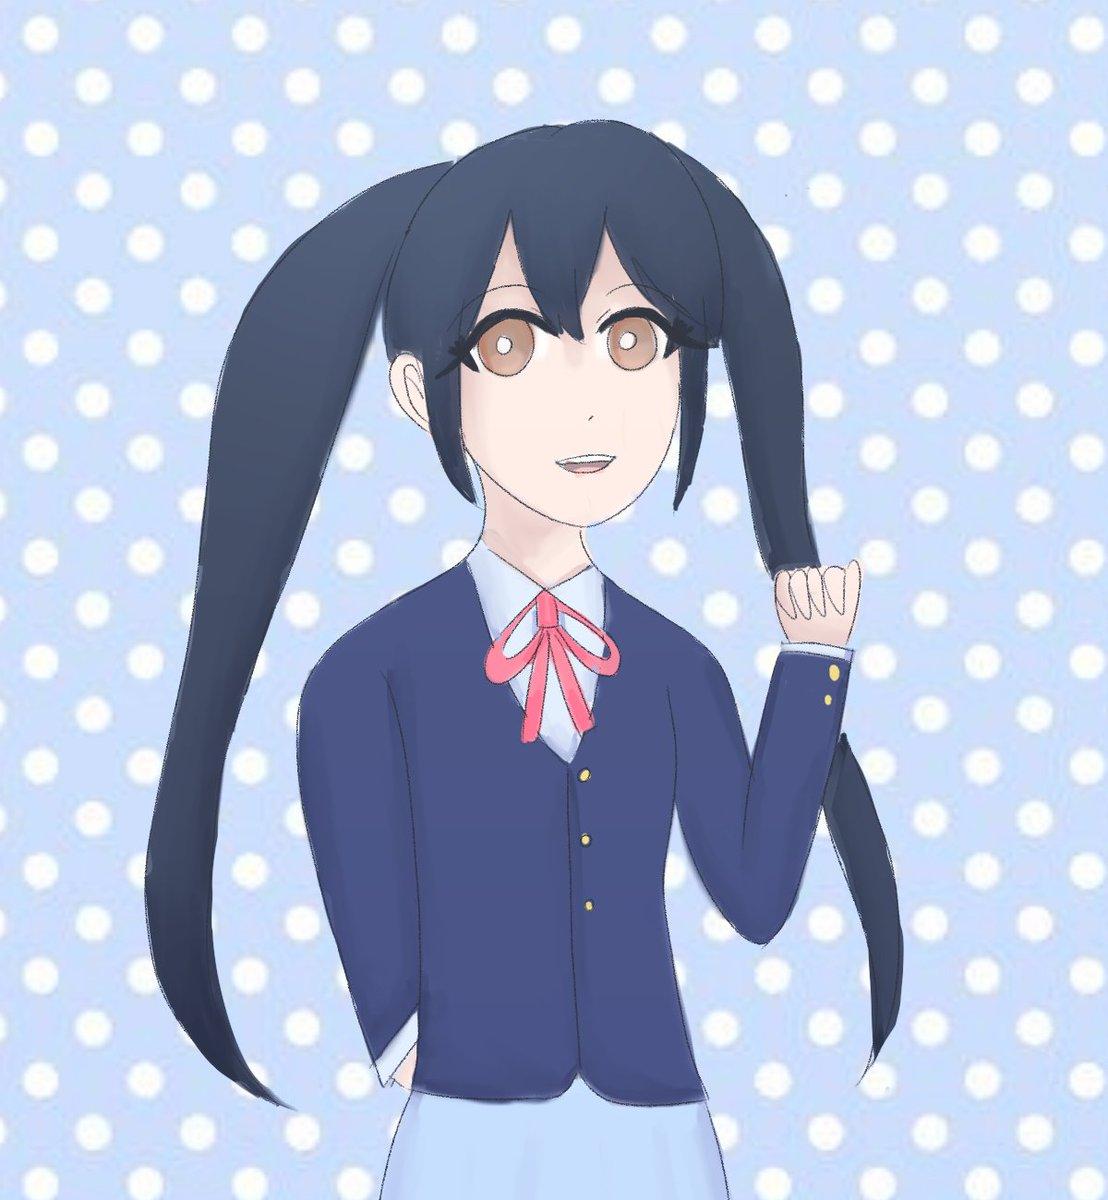 drew another k-on fanart! - #art #ArtistOnTwitter #artistsontwitter #artshare #drawing #drawings #draw #drawingoftheday #illustration #Illustrations #illustrationart #illustrationartists #anime #AnimeArt #animetwt #animefanart #kon #kyoani #azusanakano